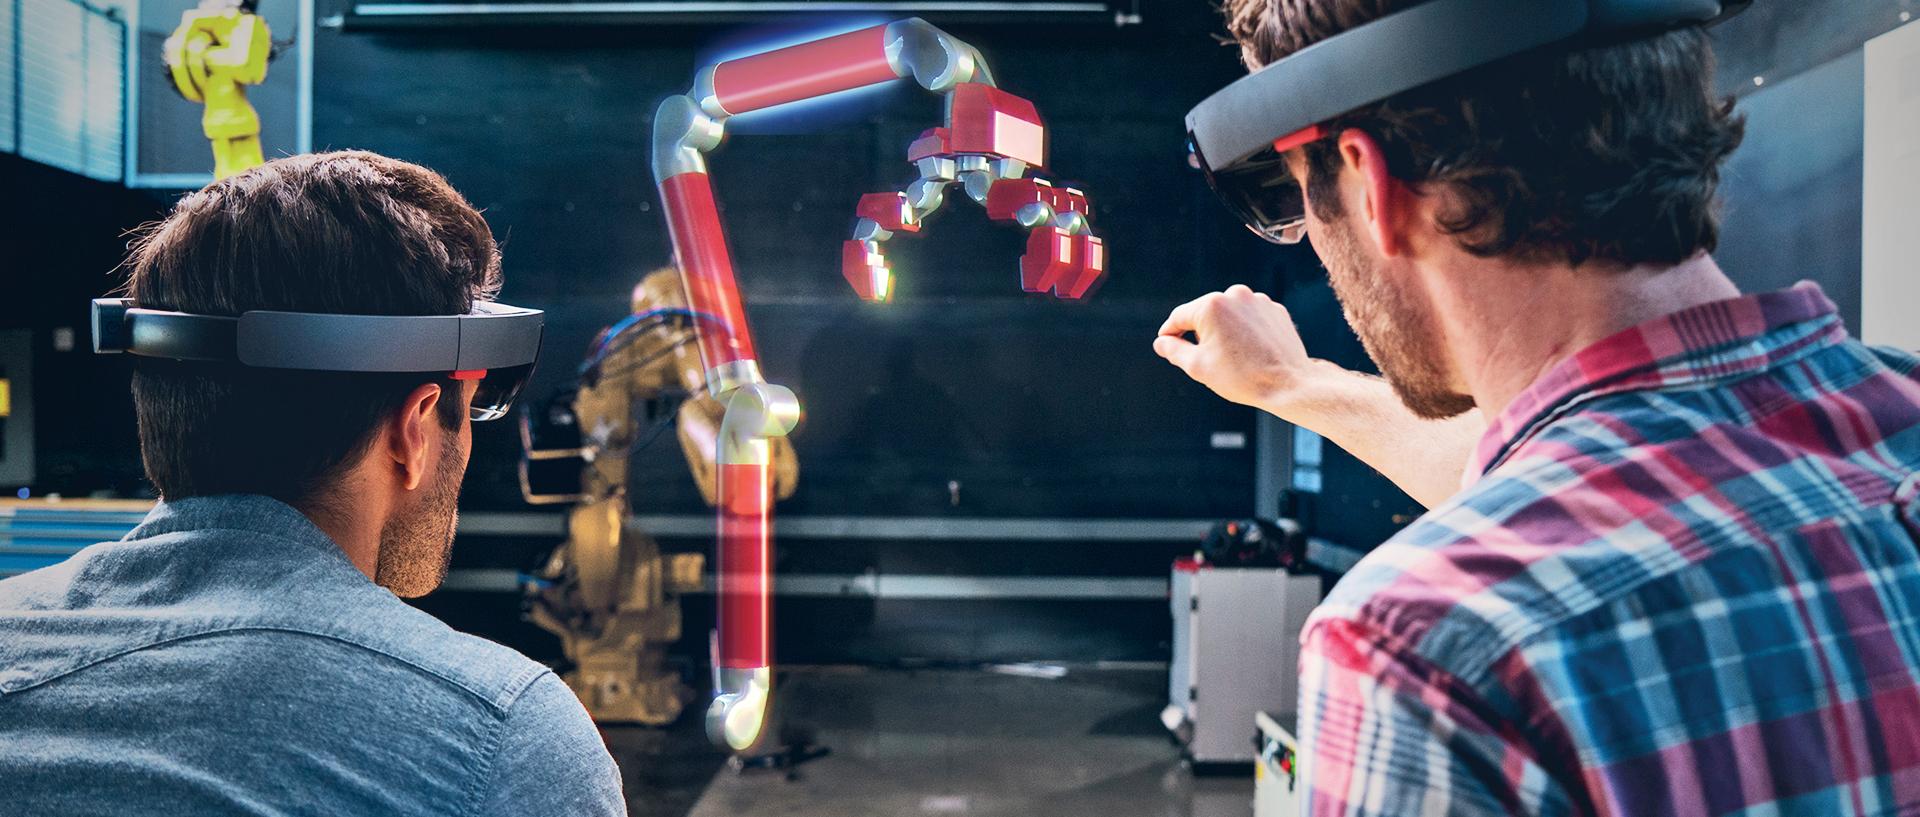 Virtual Reality Goes Mainstream